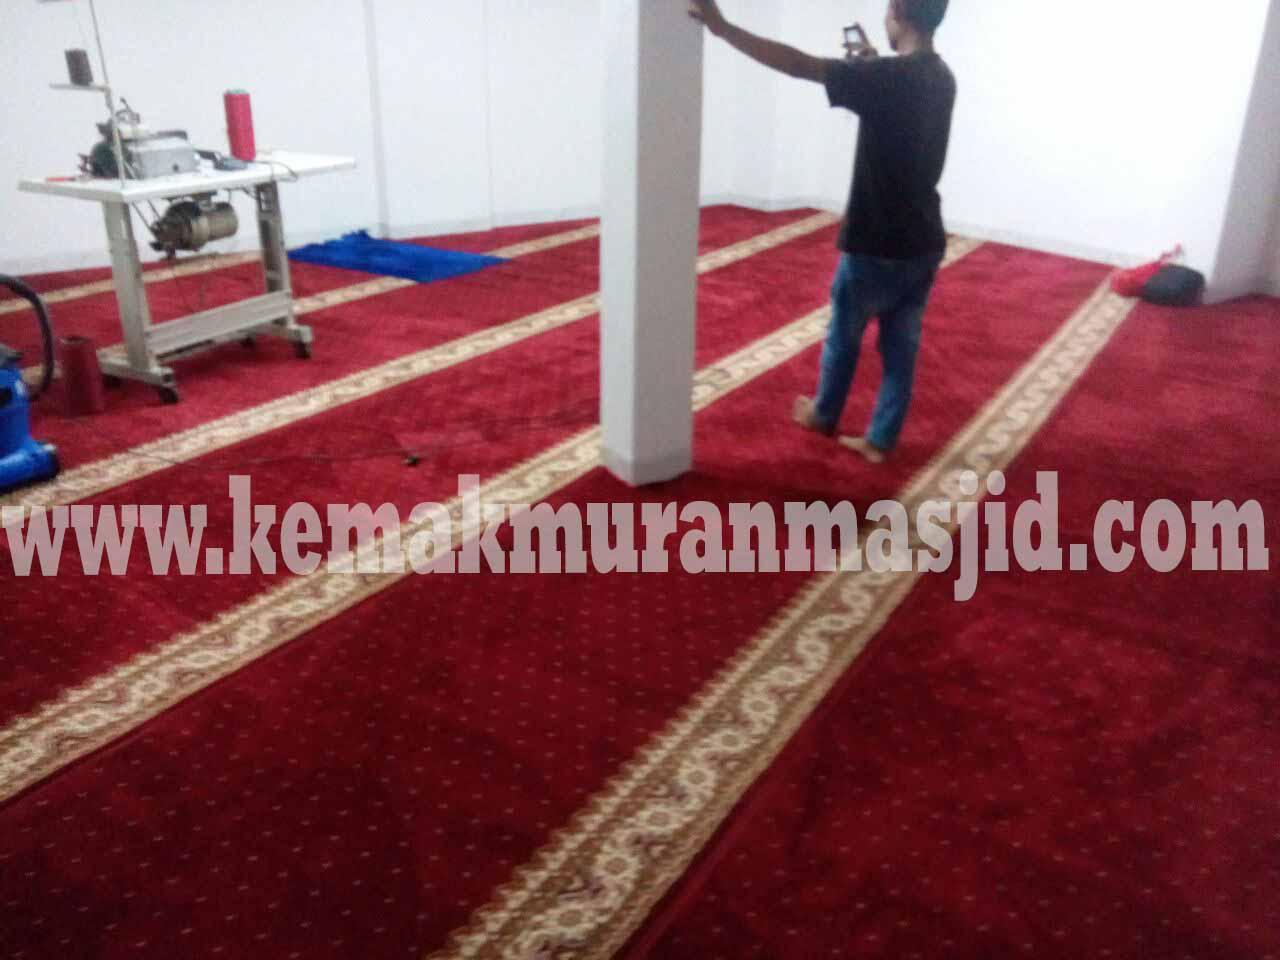 Jual Karpet Masjid, Bekasi, Jatiasih, Kota Bekasi, Jawa Barat